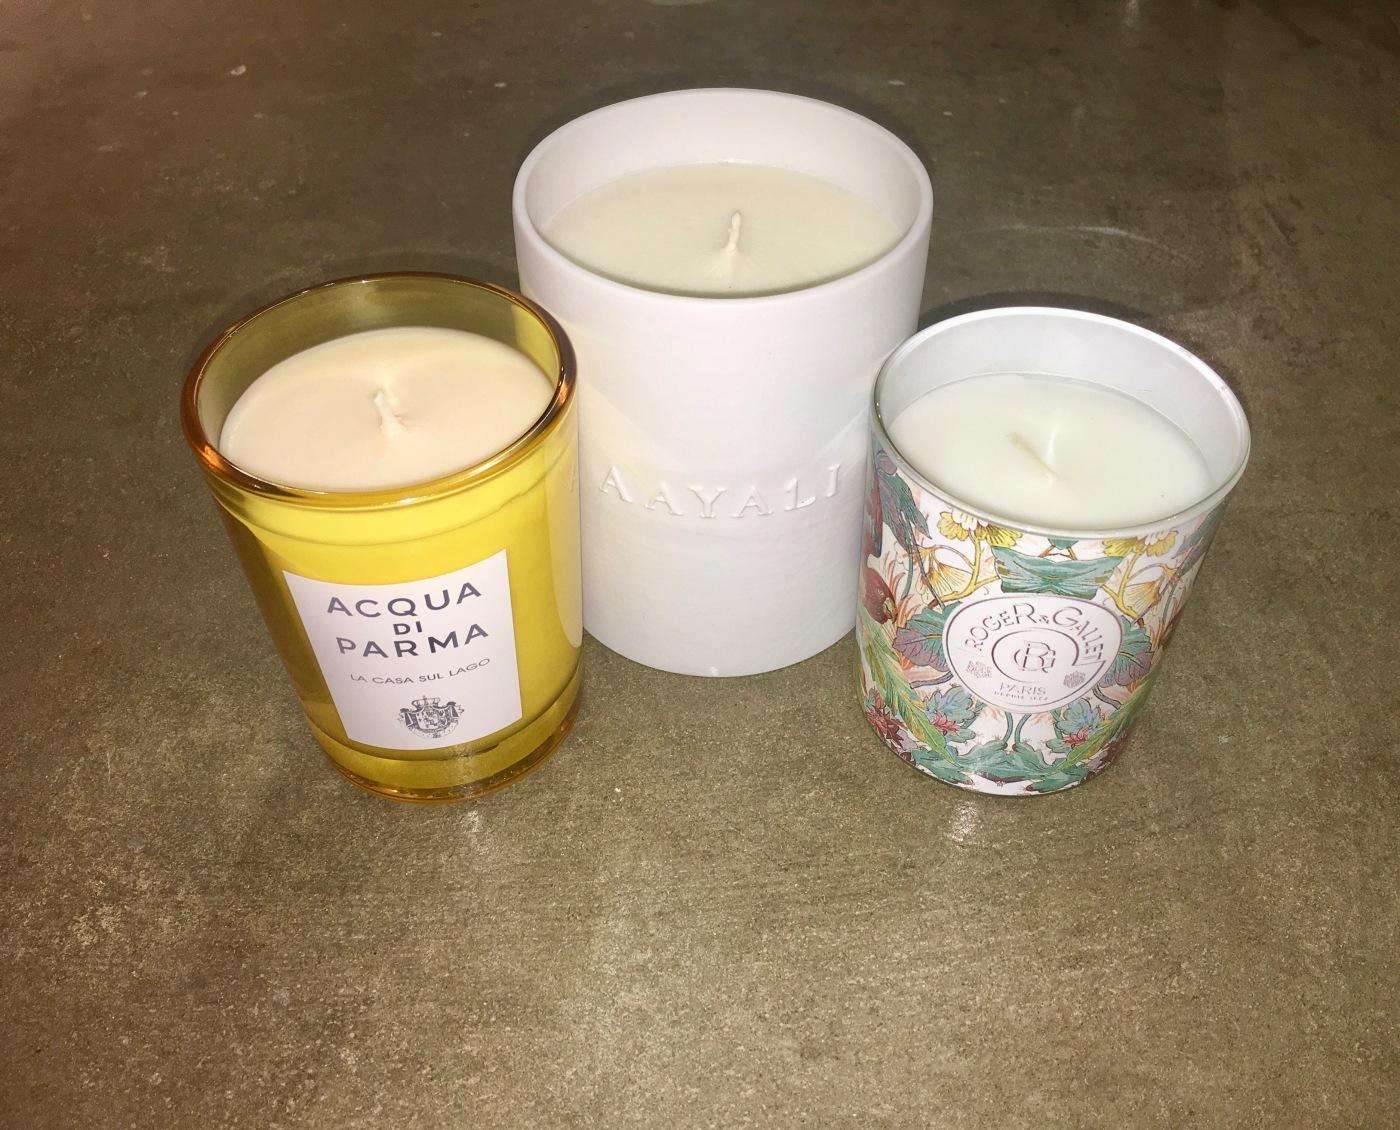 hayali scented candle acqua di parma roger & gallet